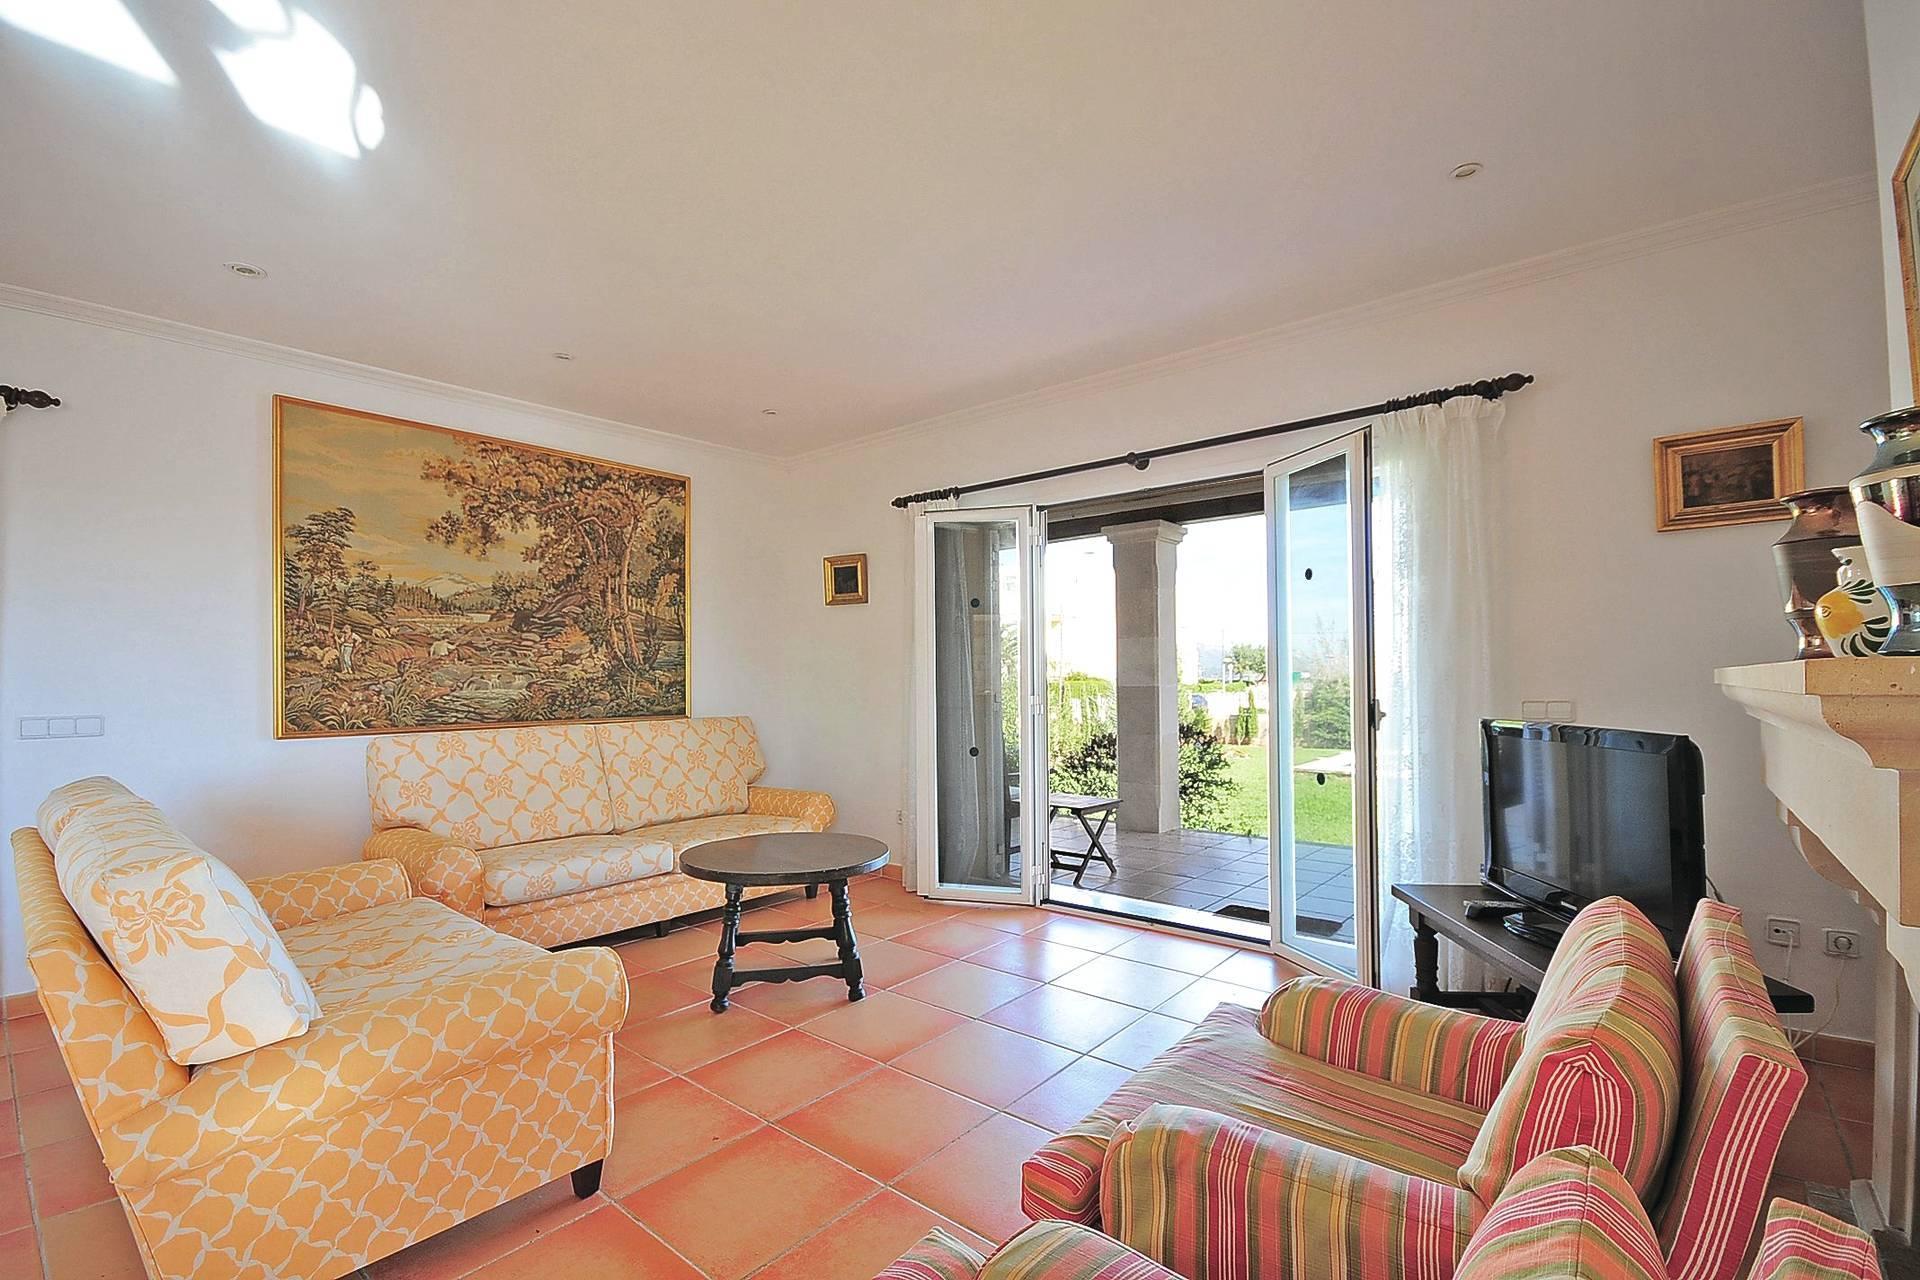 01-233 Ferienhaus am Strand Mallorca Norden Bild 7